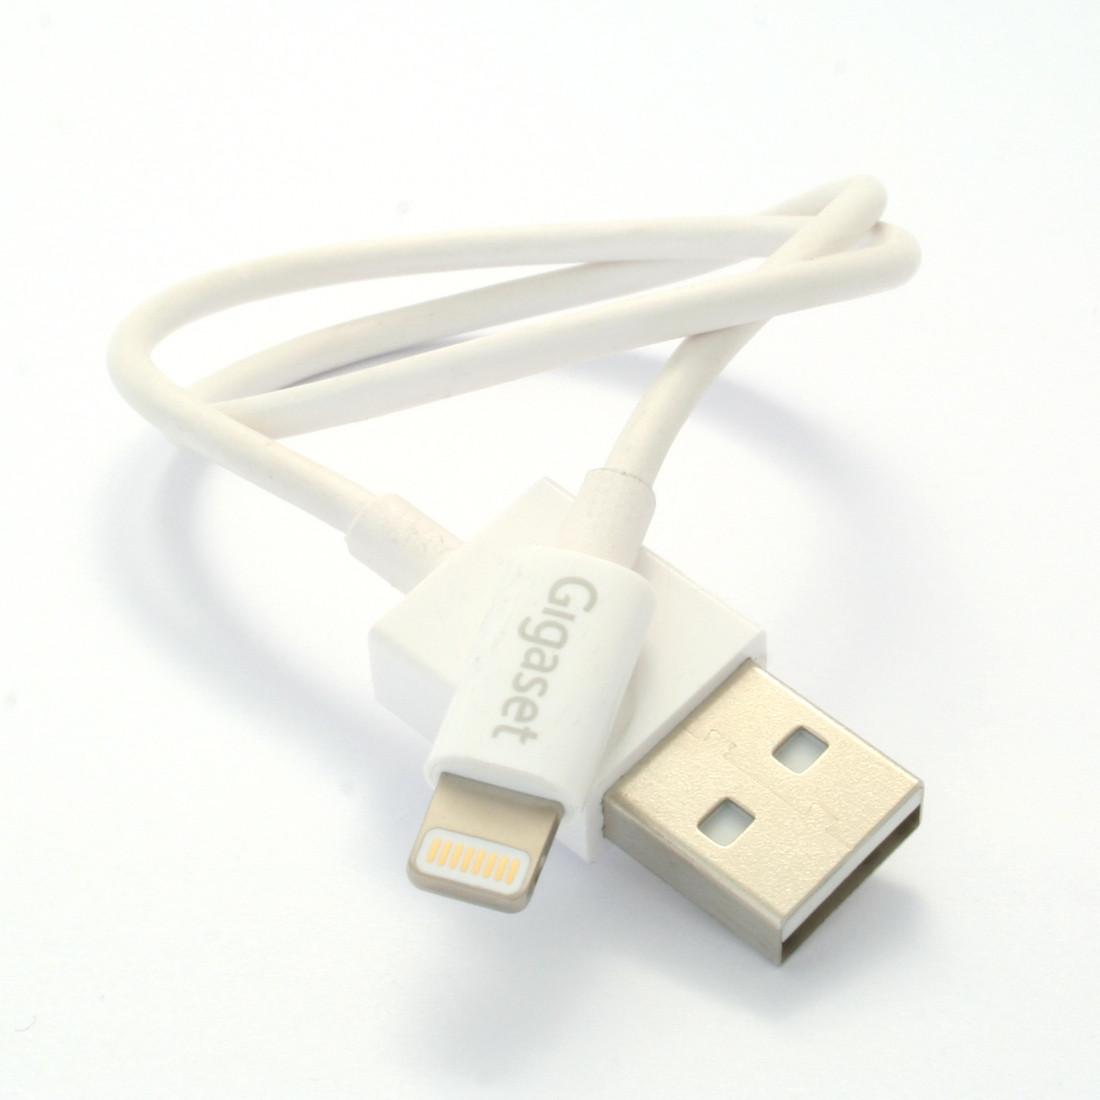 Cavo USB originale per Gigaset MobileDock LM550i